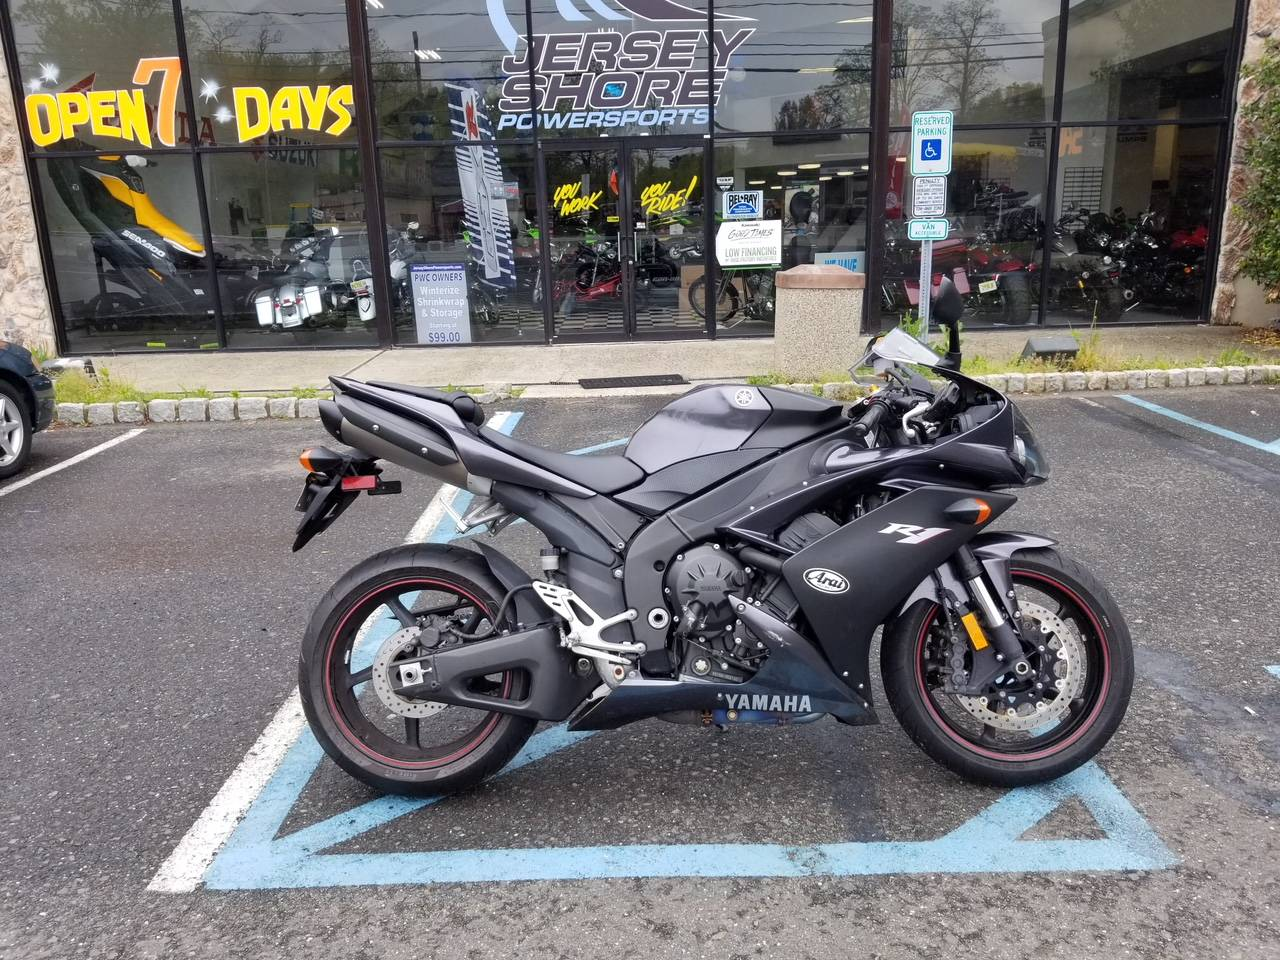 2007 Yamaha YZF-R1 for sale 158385